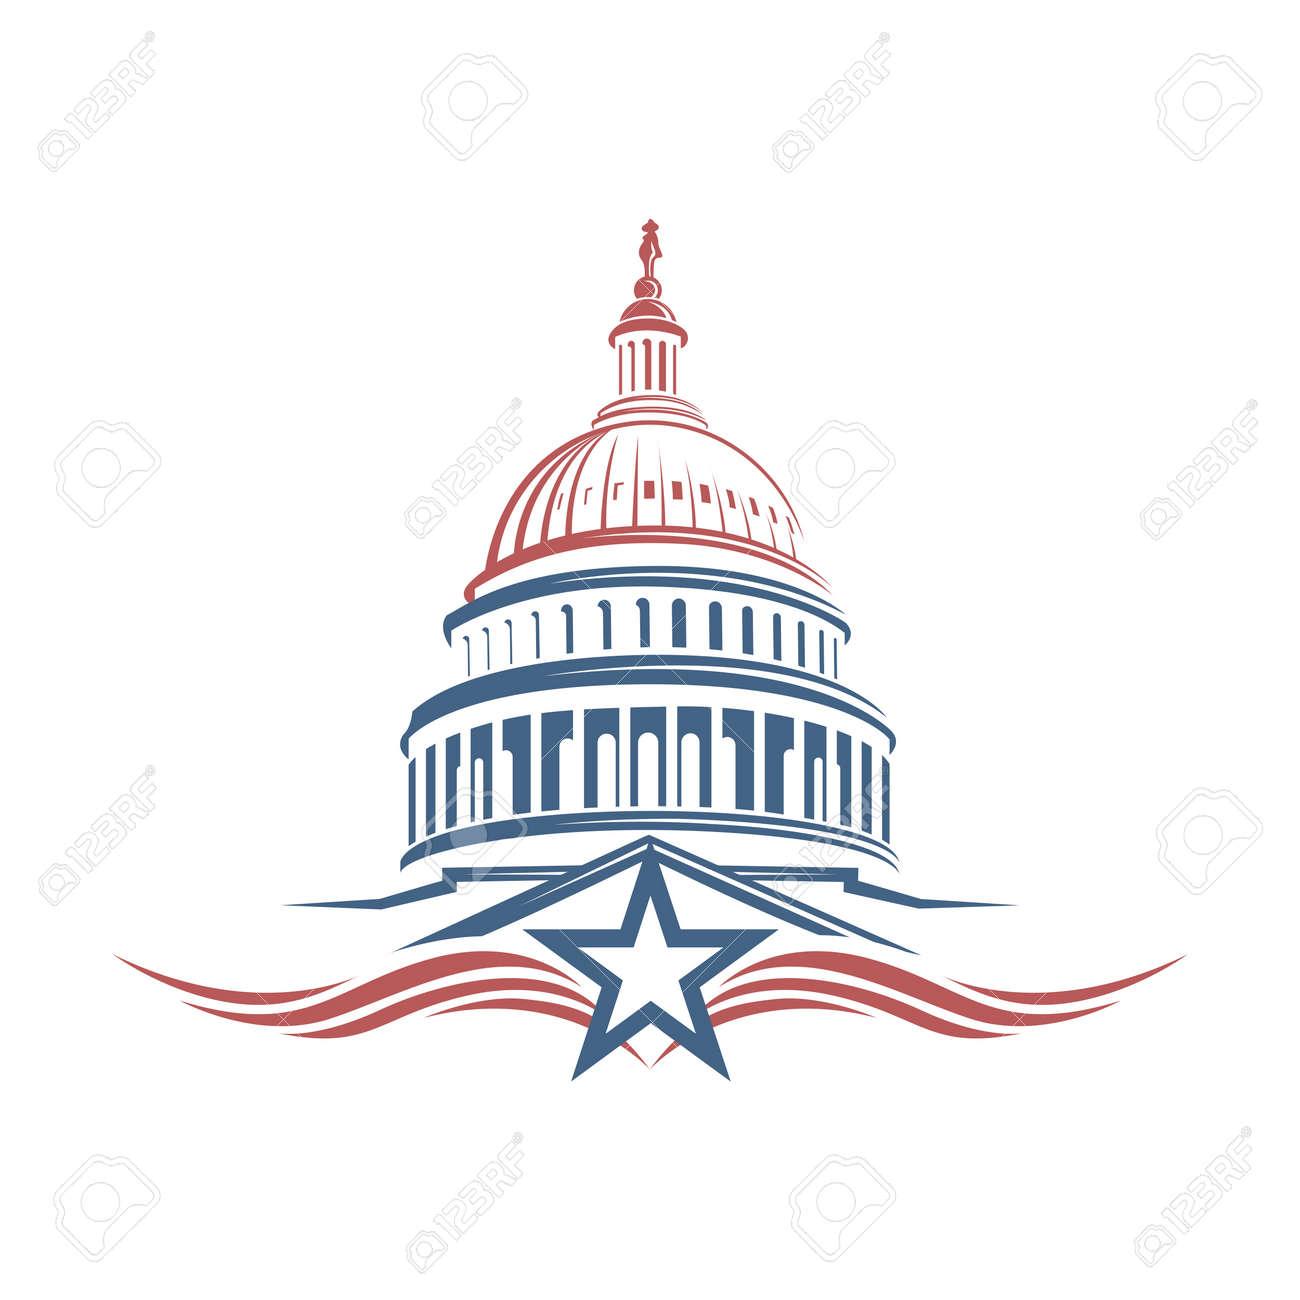 United States Capitol building icon in Washington DC - 97529798